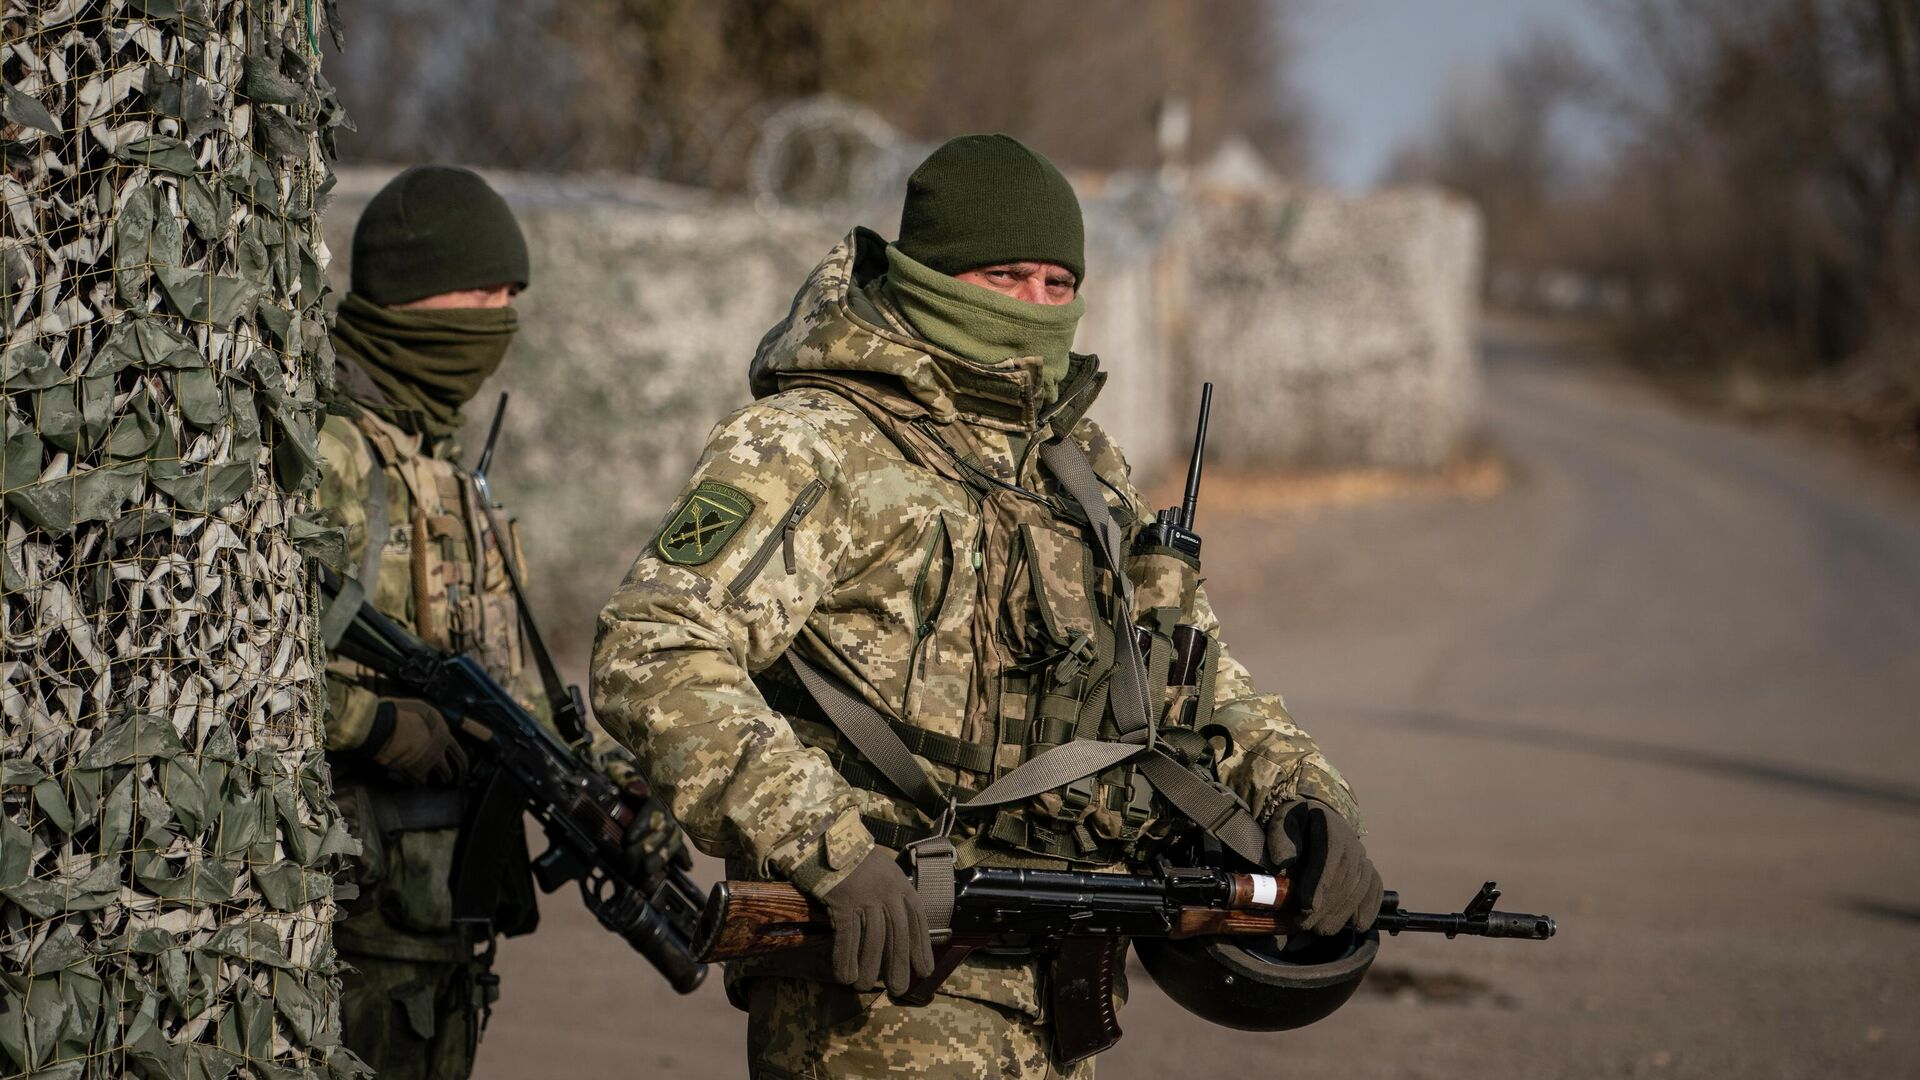 В центре Киева задержали двух мужчин с боевыми гранатами